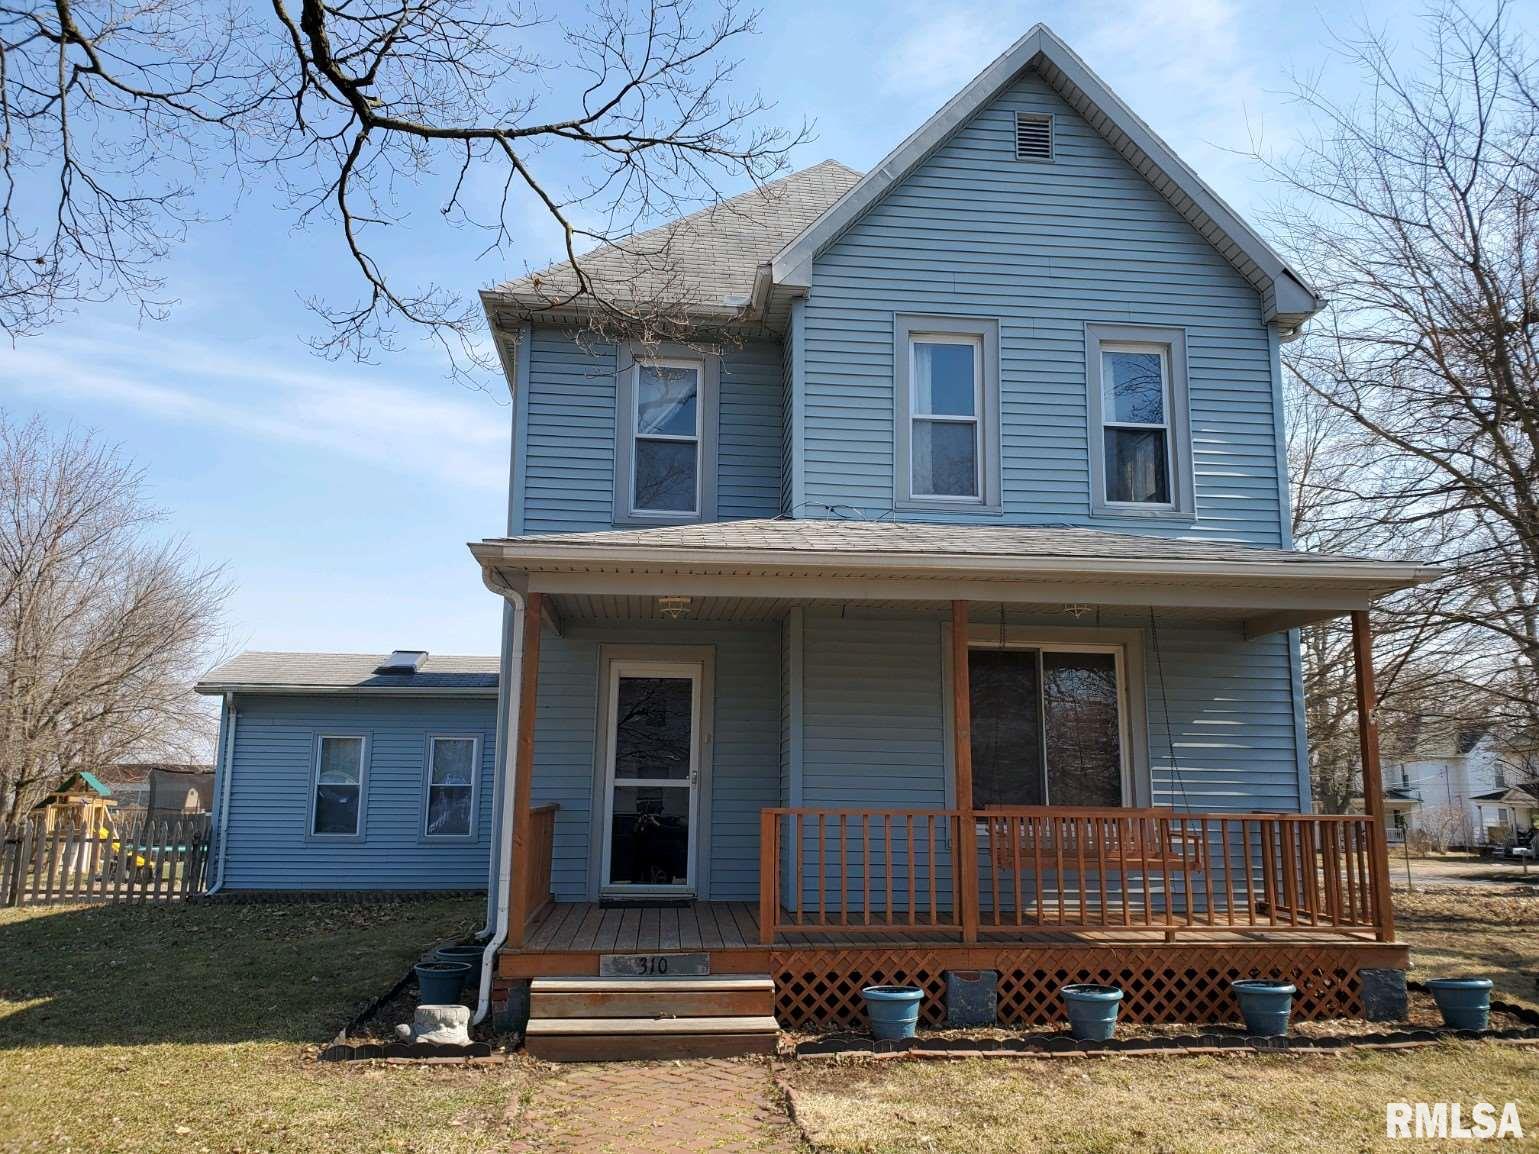 310 S CEDAR Property Photo - Delavan, IL real estate listing